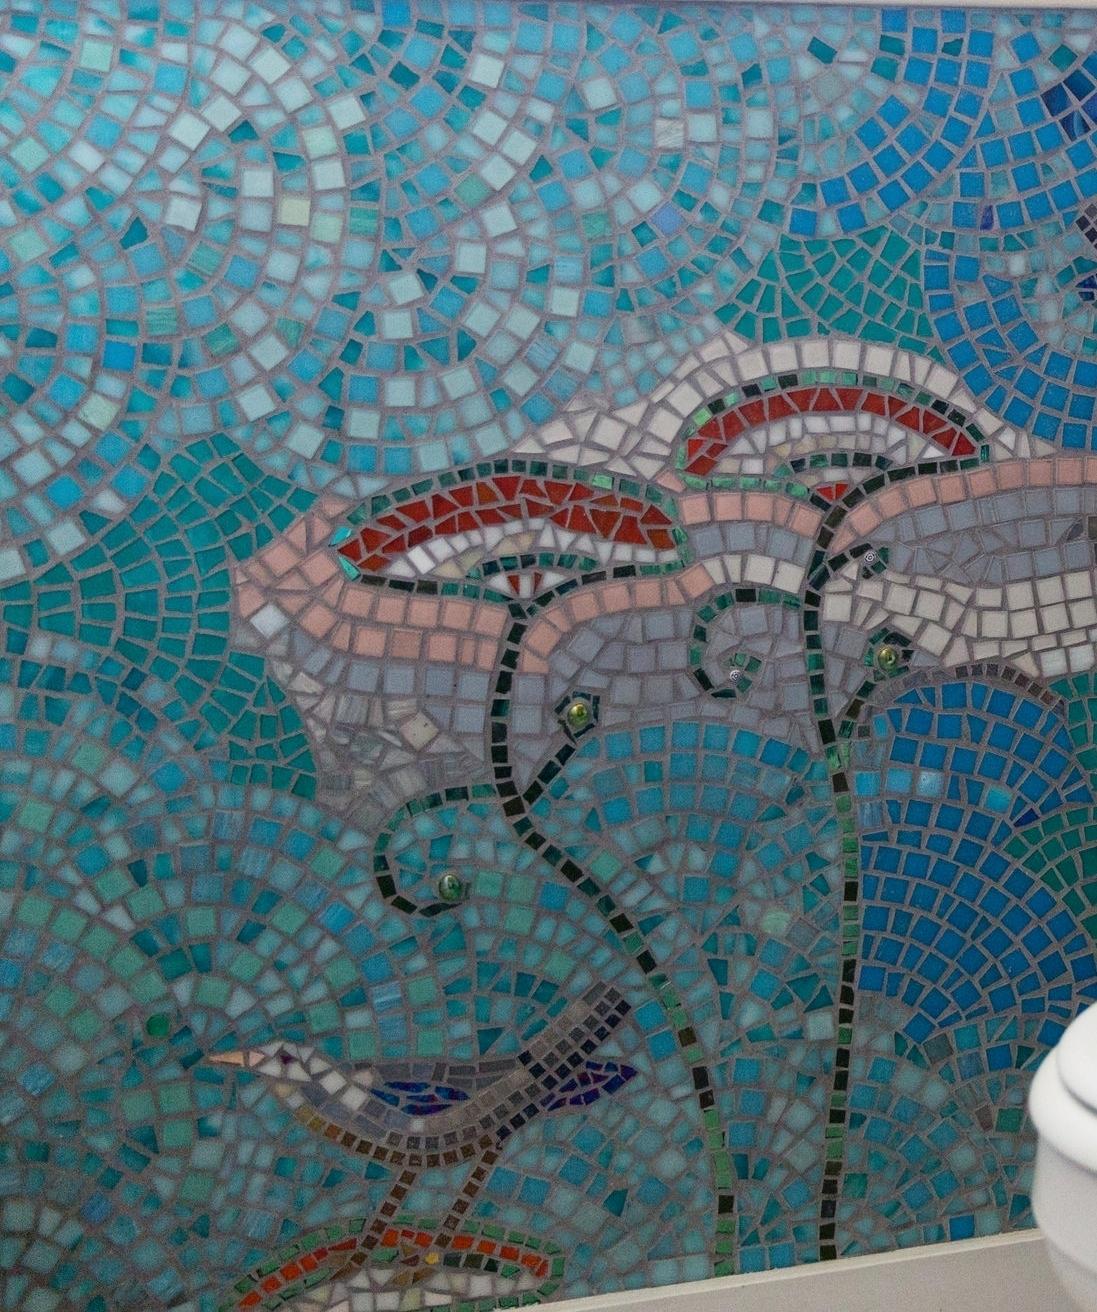 BATHROOM WALL DETAIL